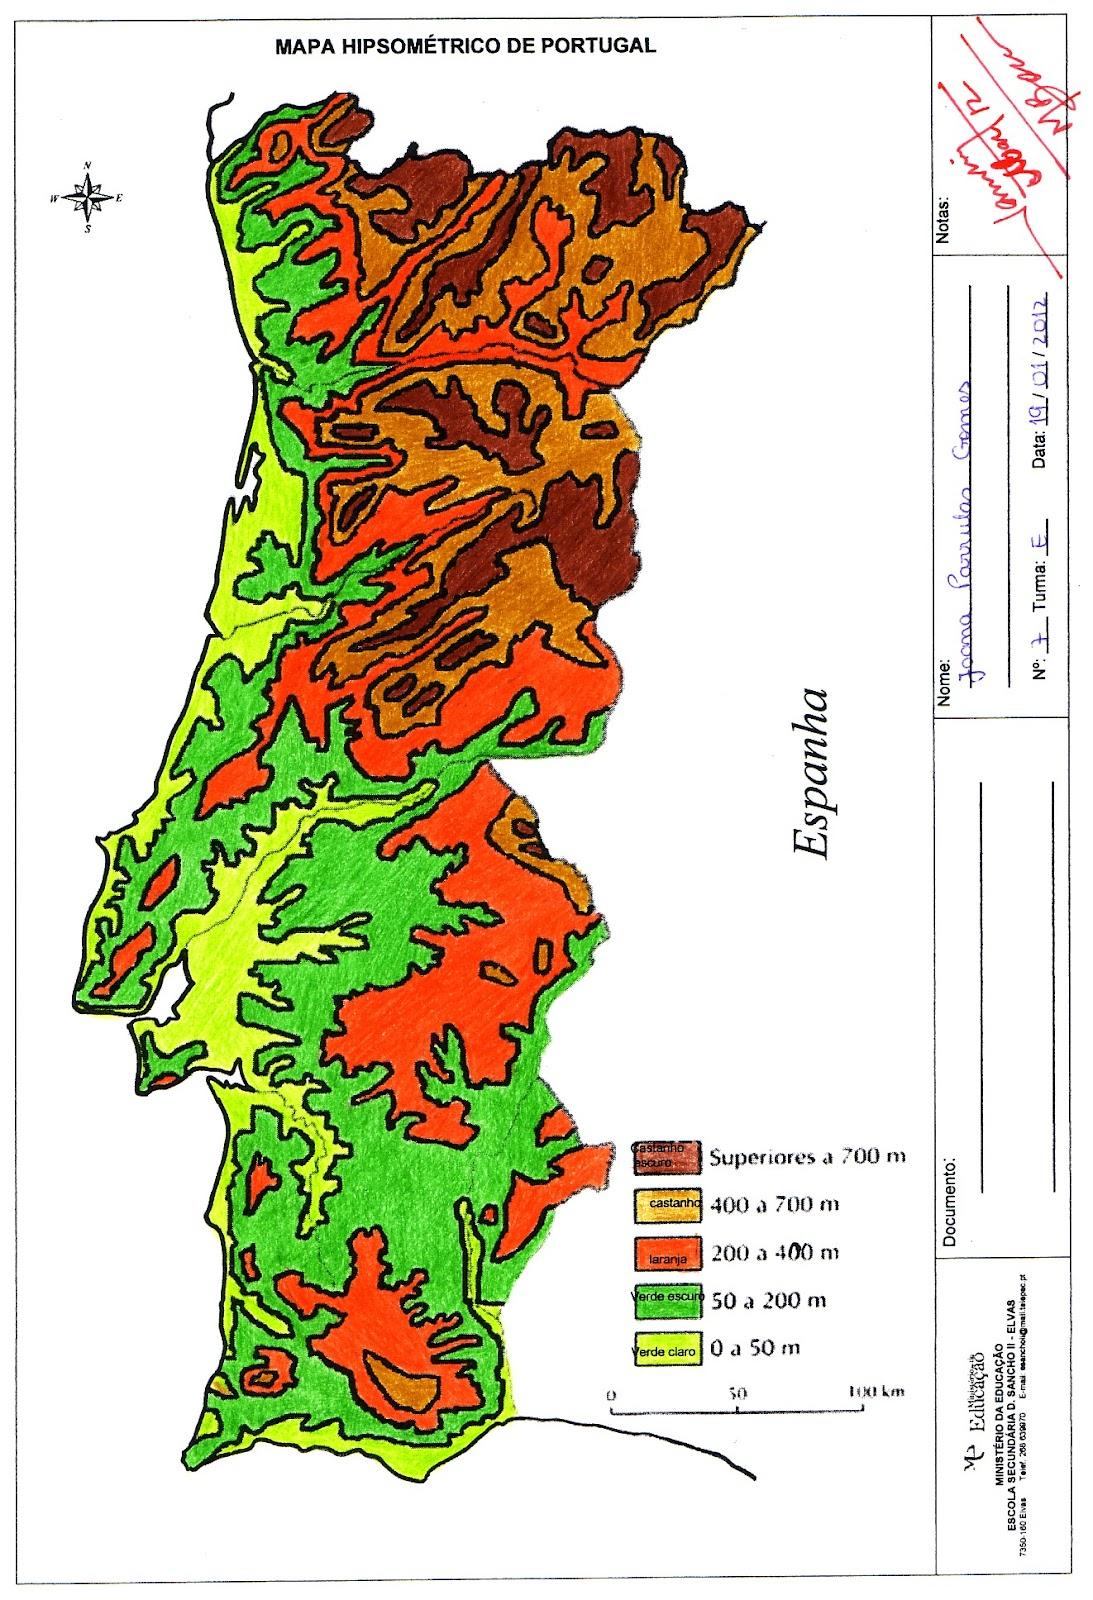 mapa hipsométrico de portugal GEO ELVAS: Mapa hipsométrico   aula cartografia mapa hipsométrico de portugal